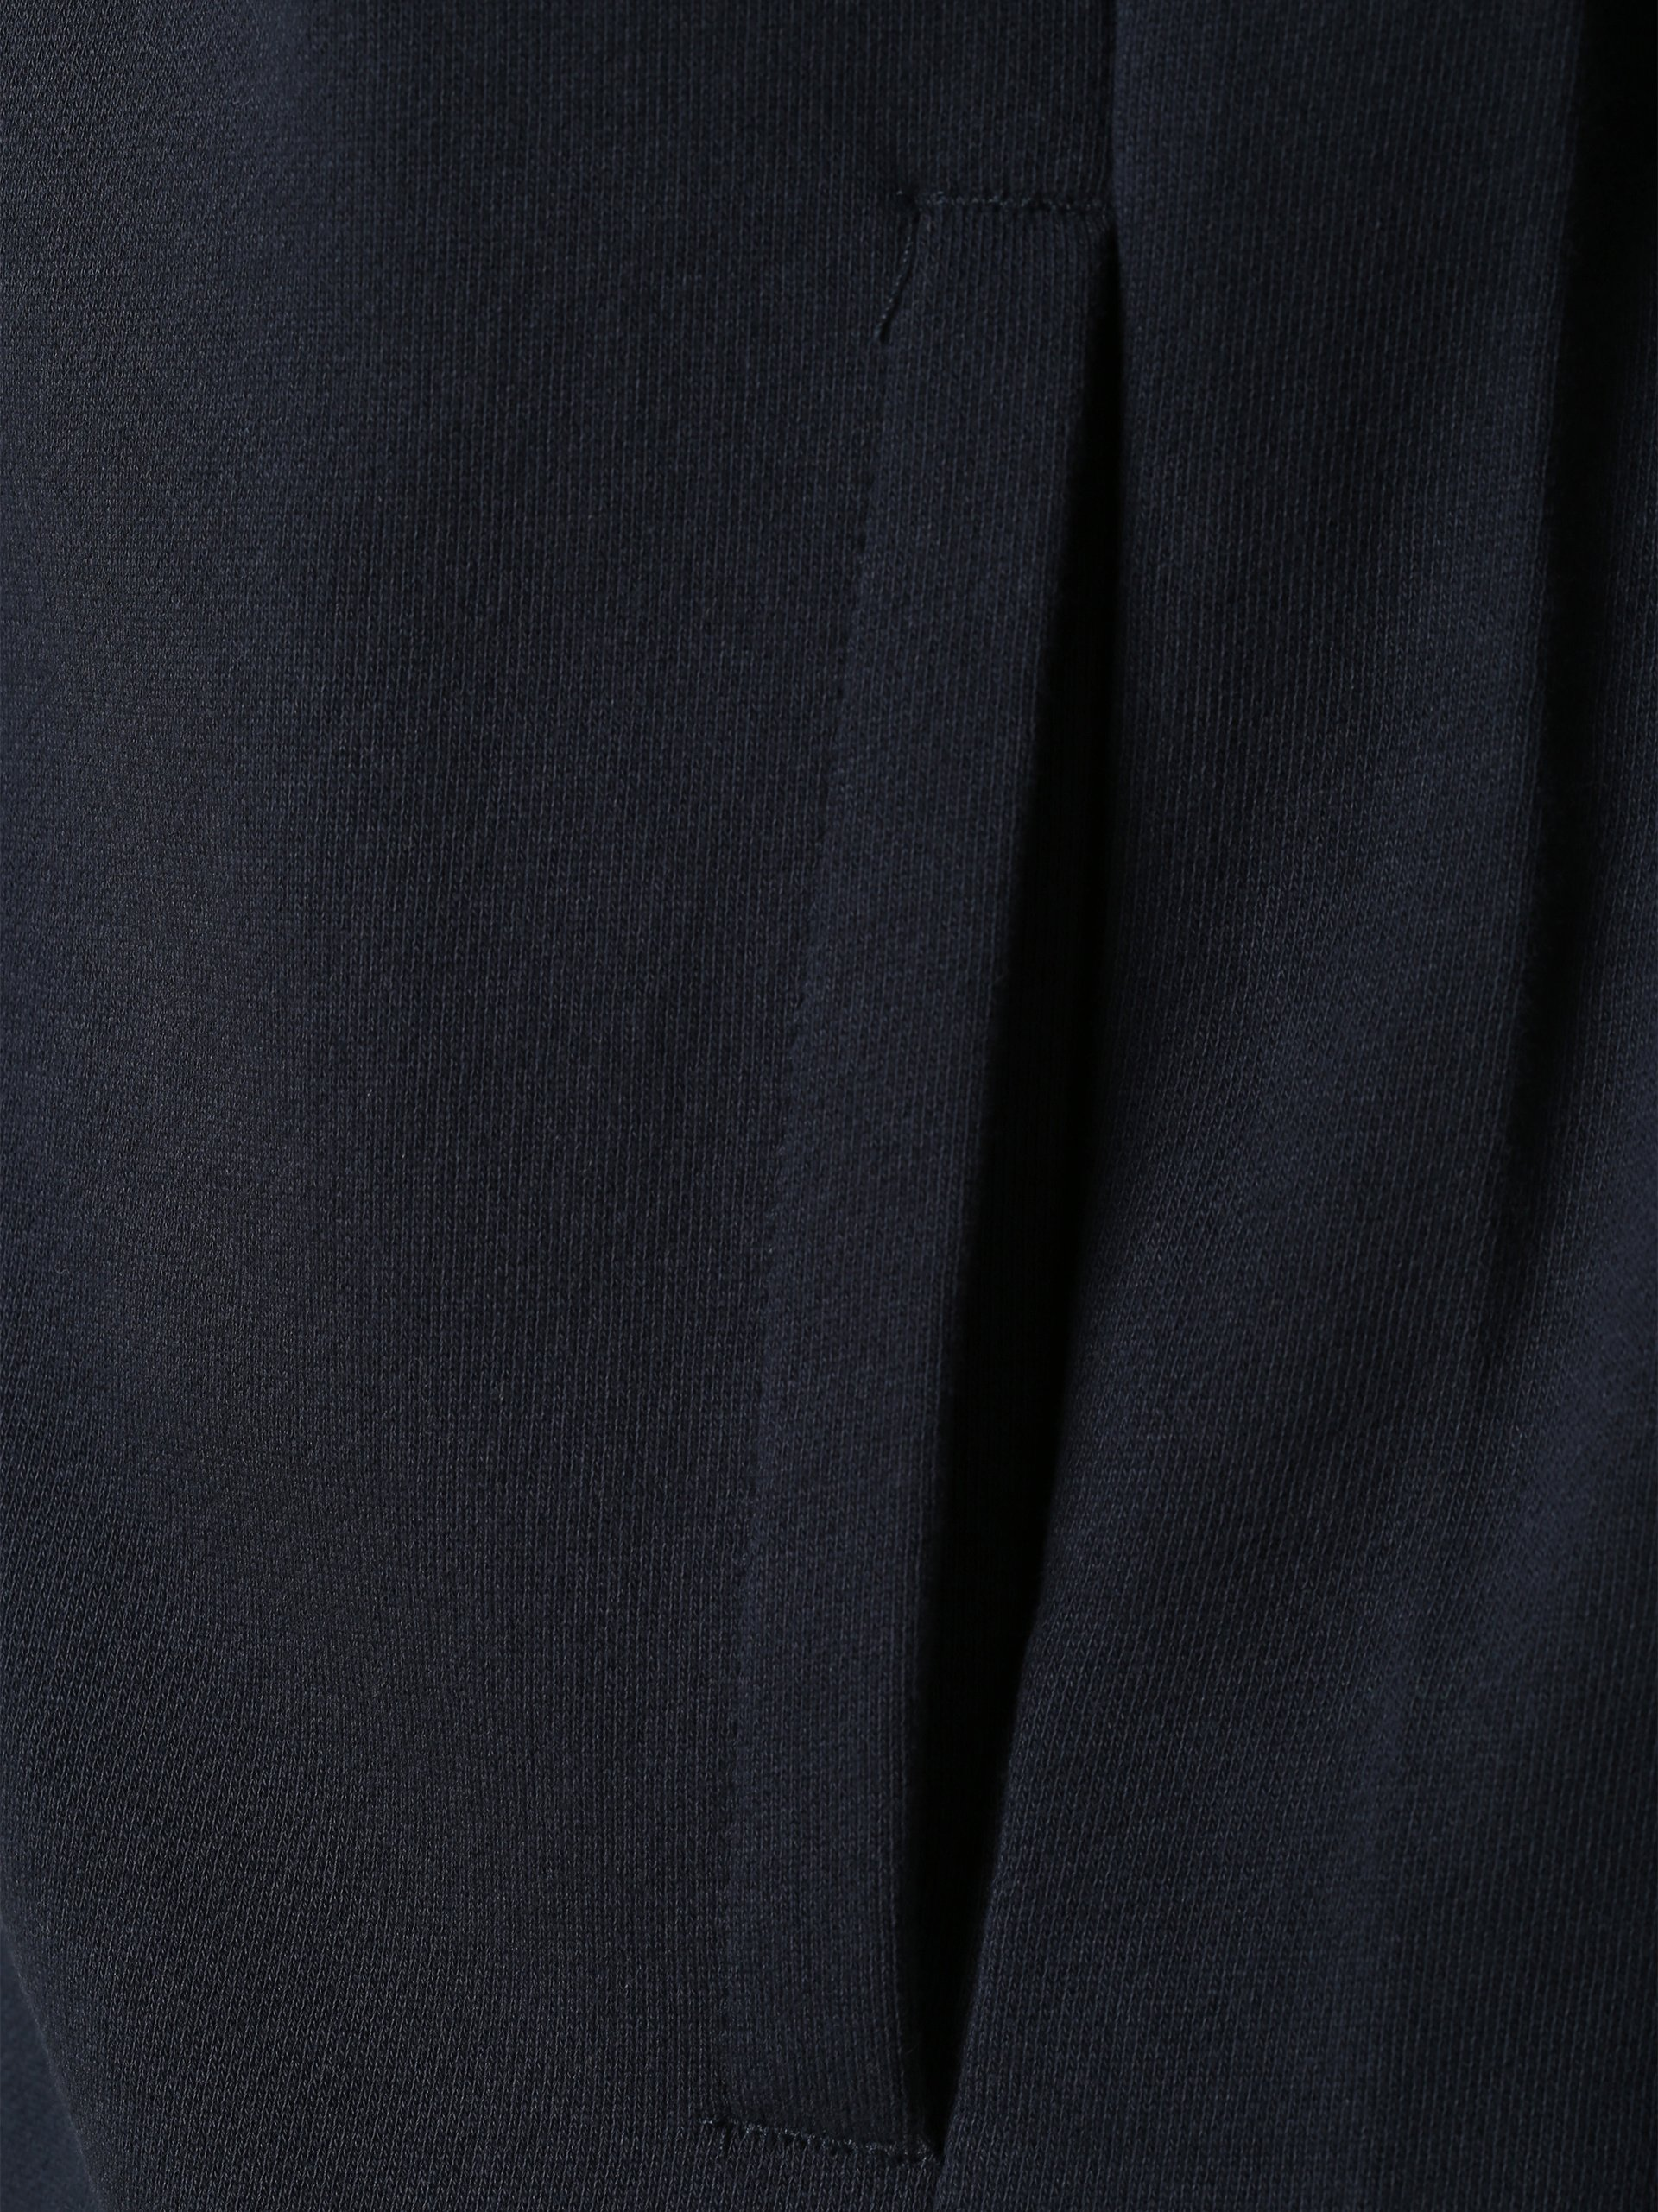 Marc O\'Polo Męska bluza rozpinana